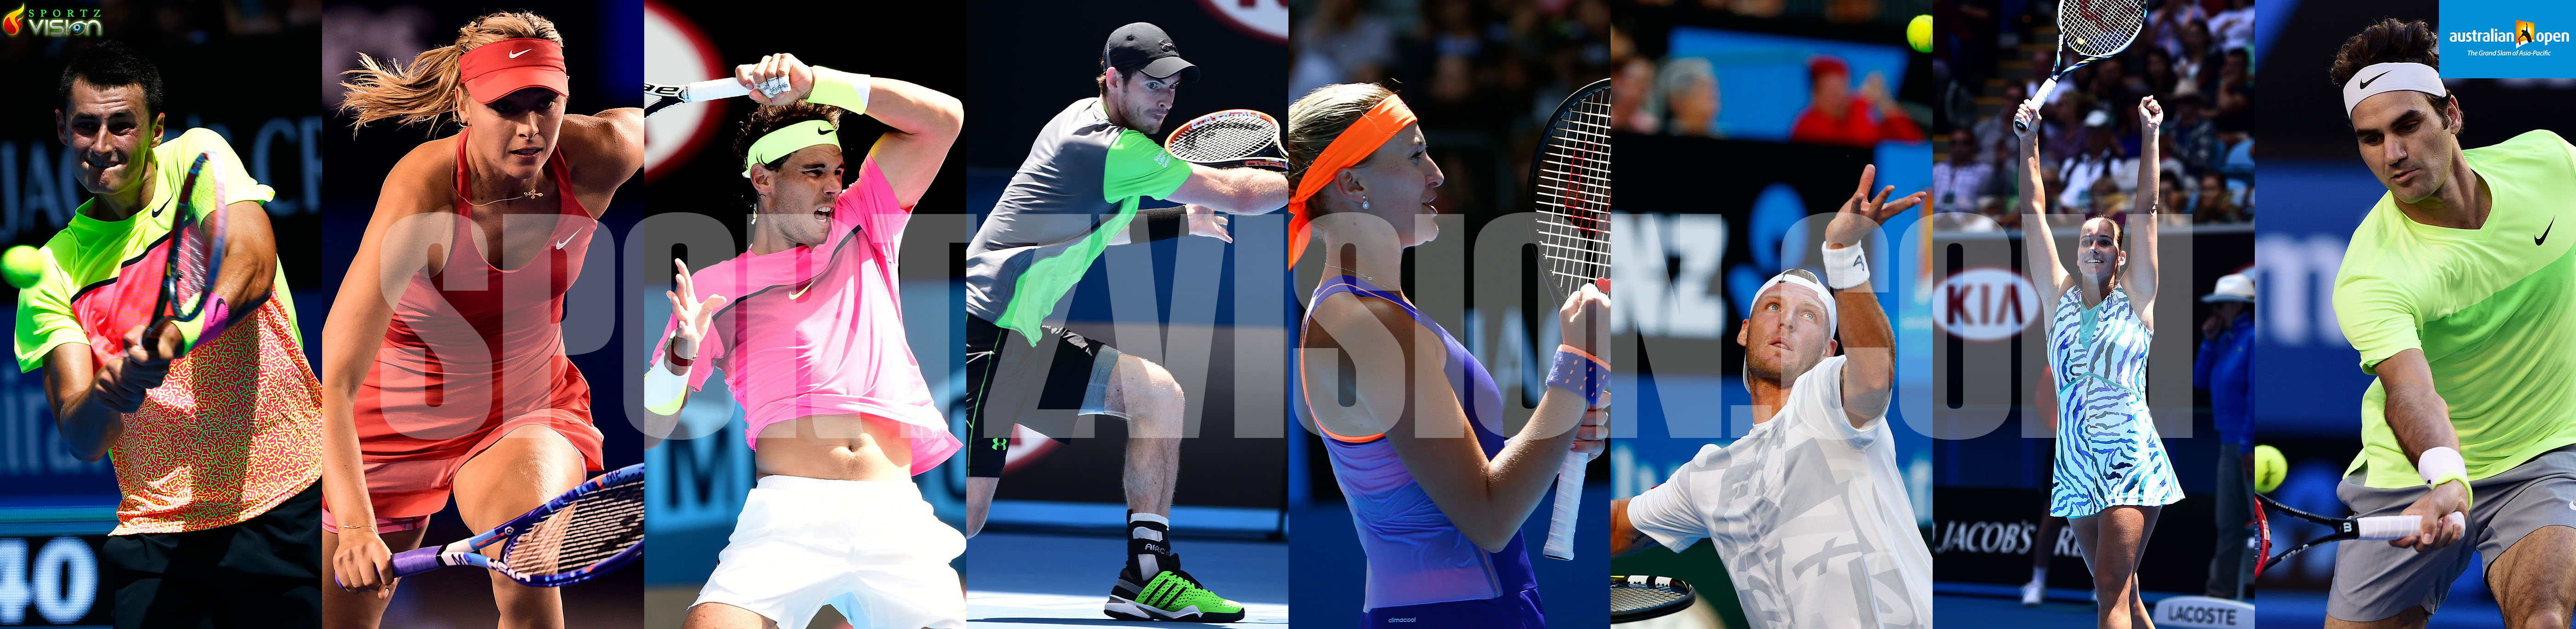 Australian-Open-Tennis-Championships-2015